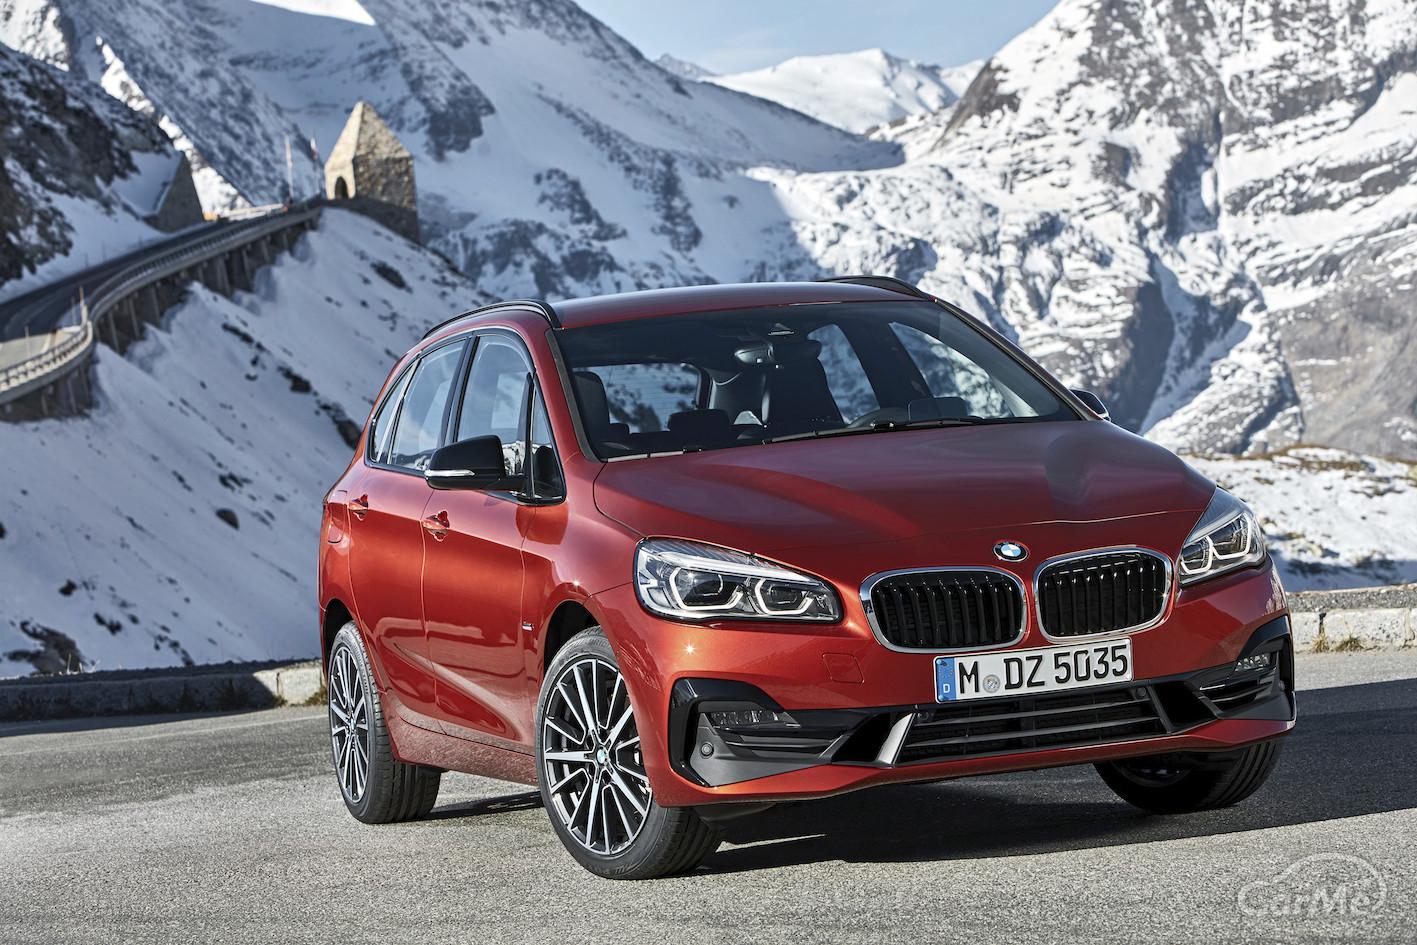 BMW 初代2シリーズにラインナップされた便利なオプションを紹介!